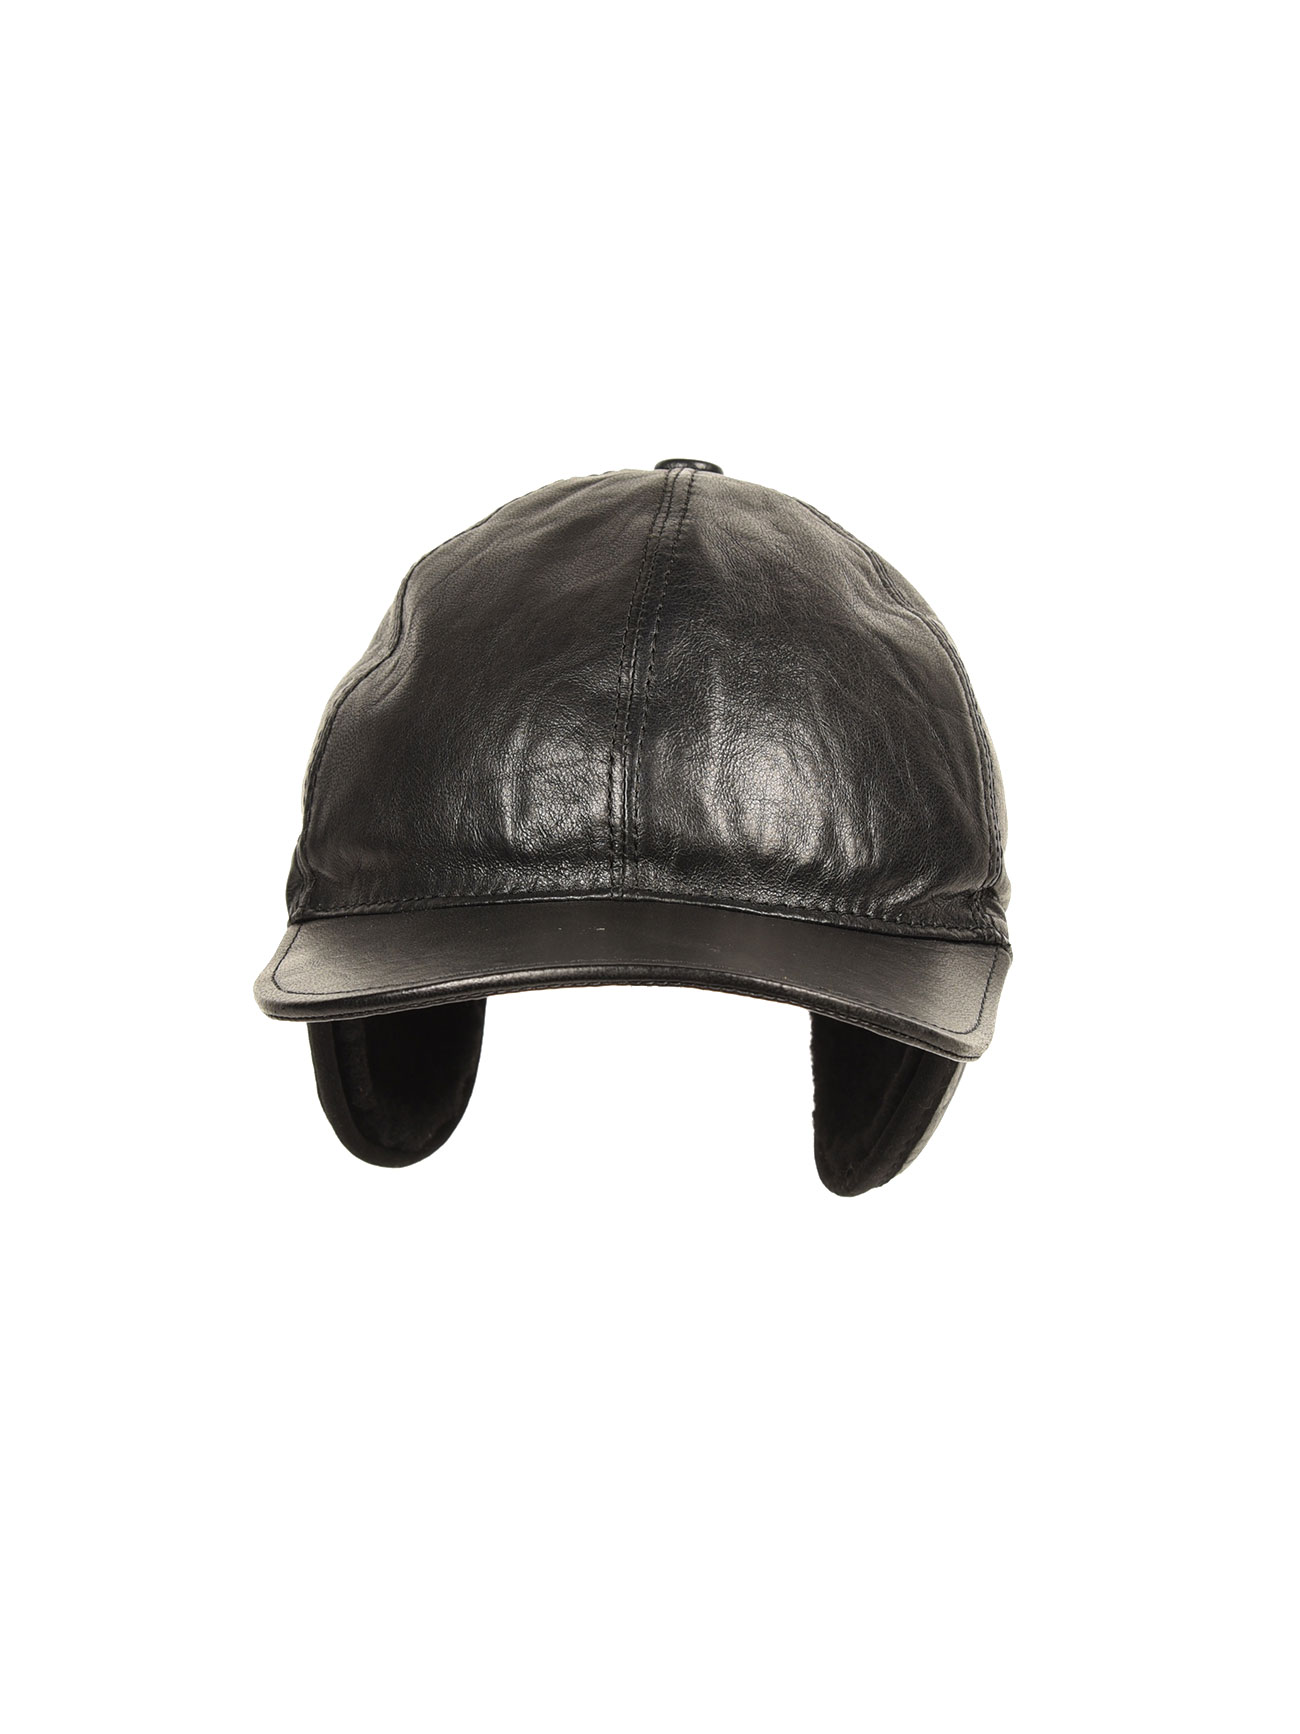 4cff6c96760 Roma Insulated Baseball Cap